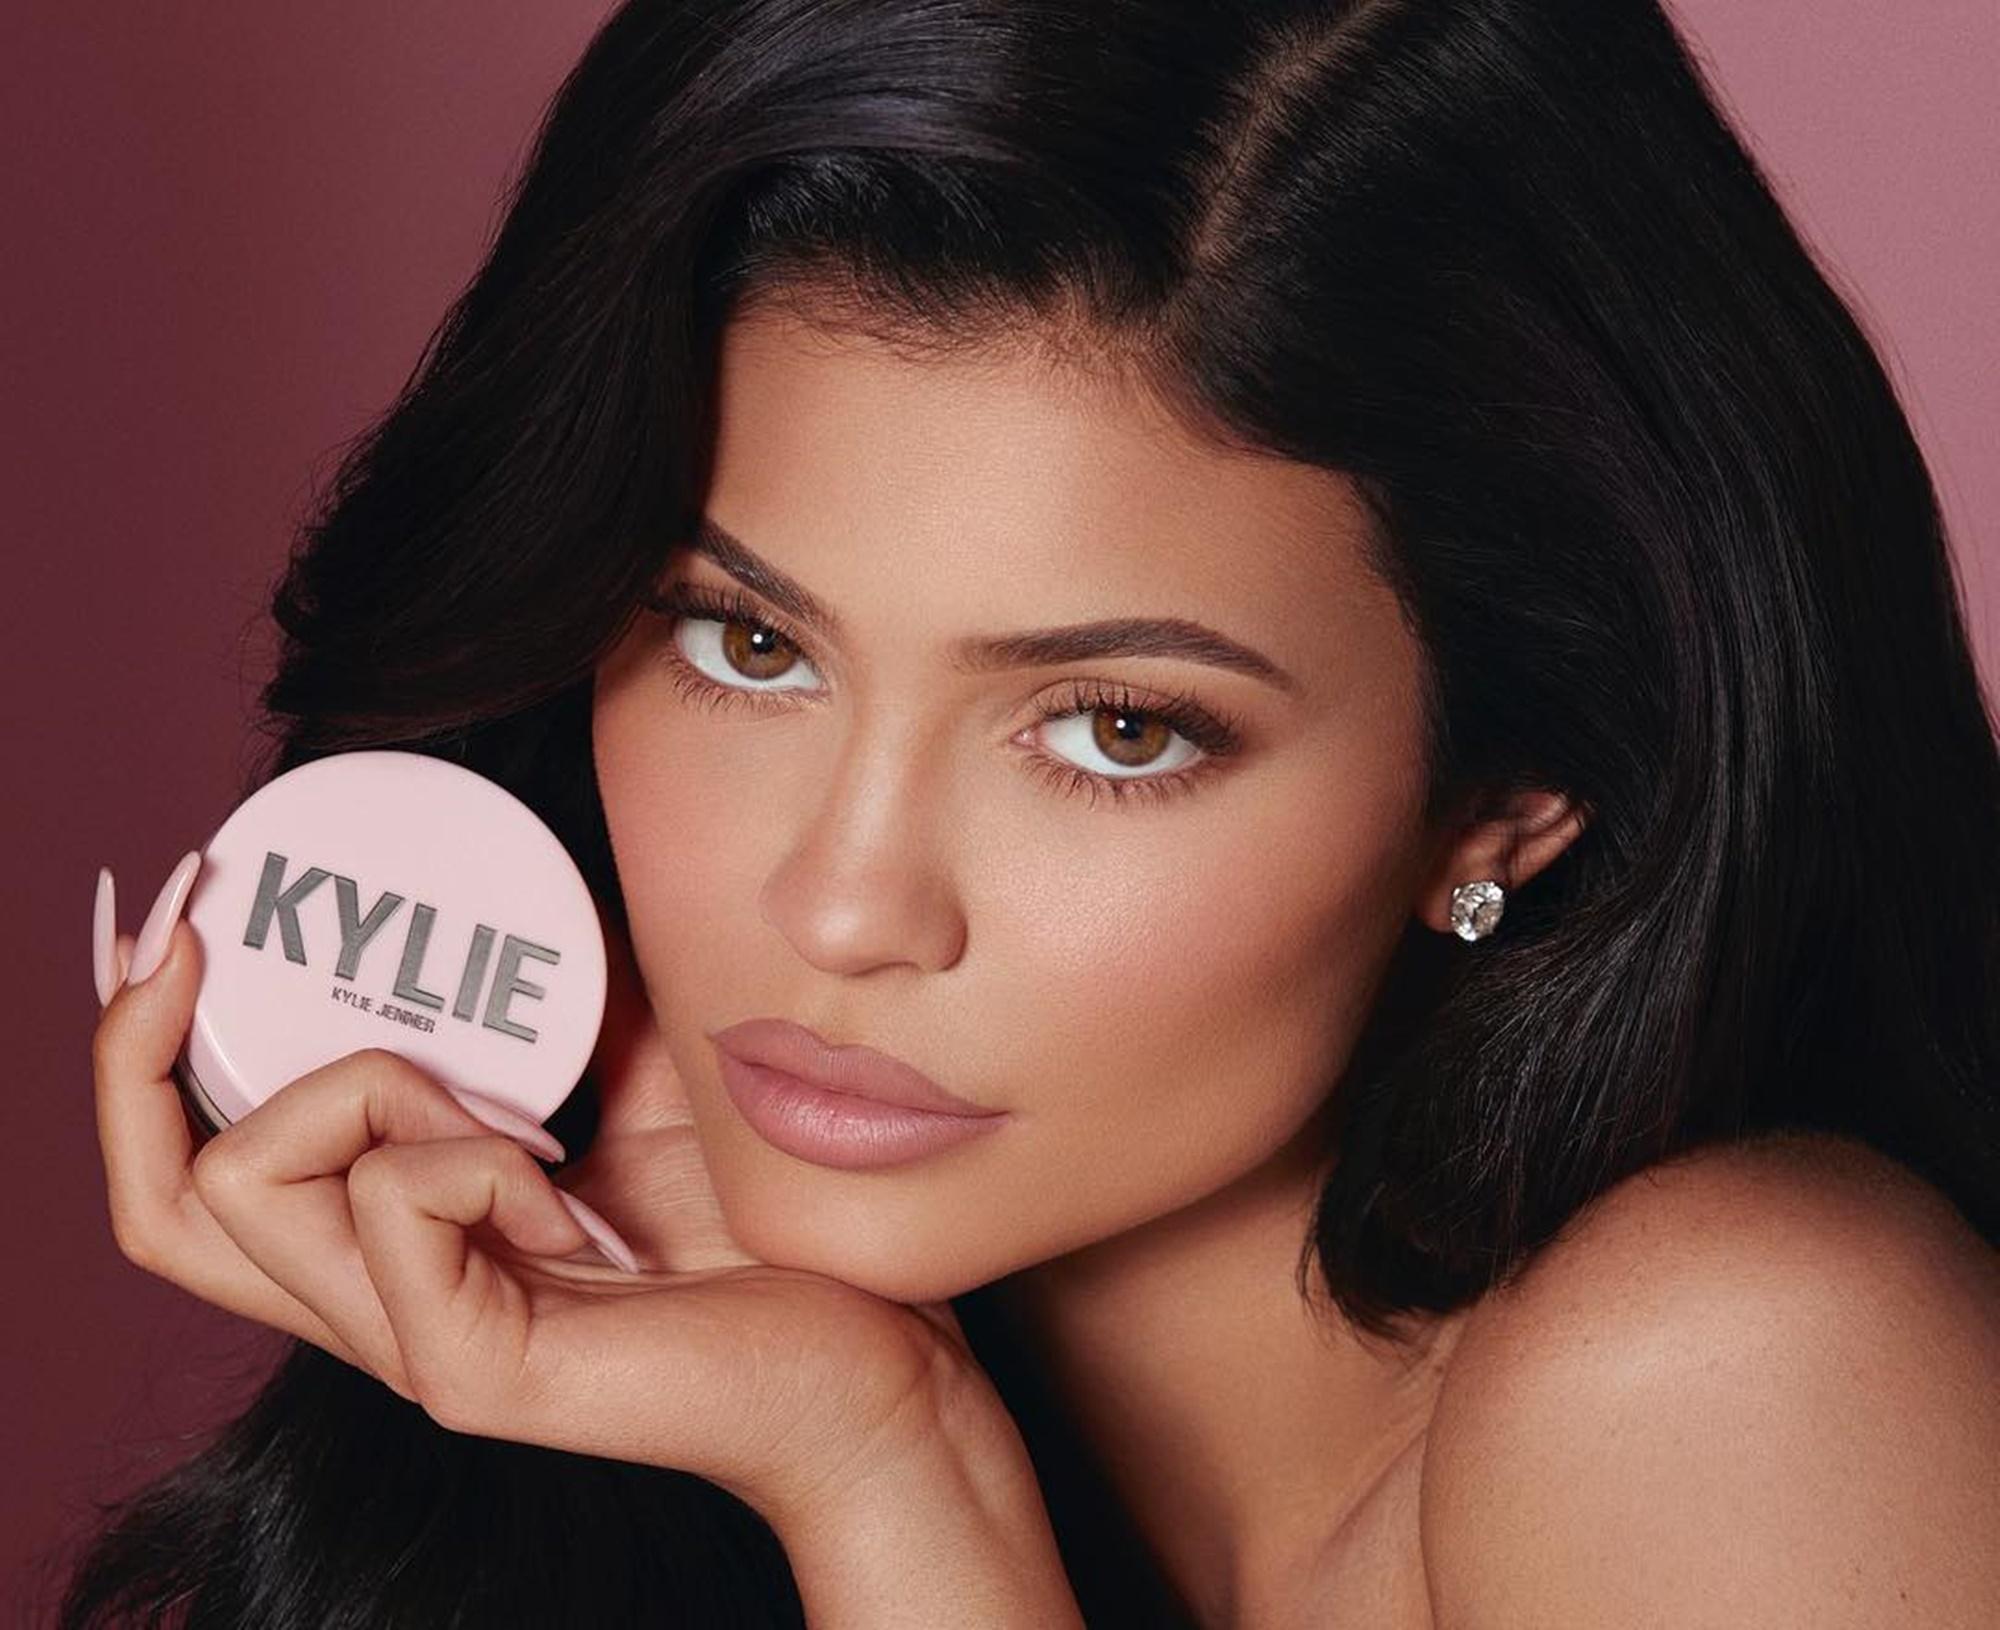 Kylie Jenner Khloe Kardashian Travis Scott